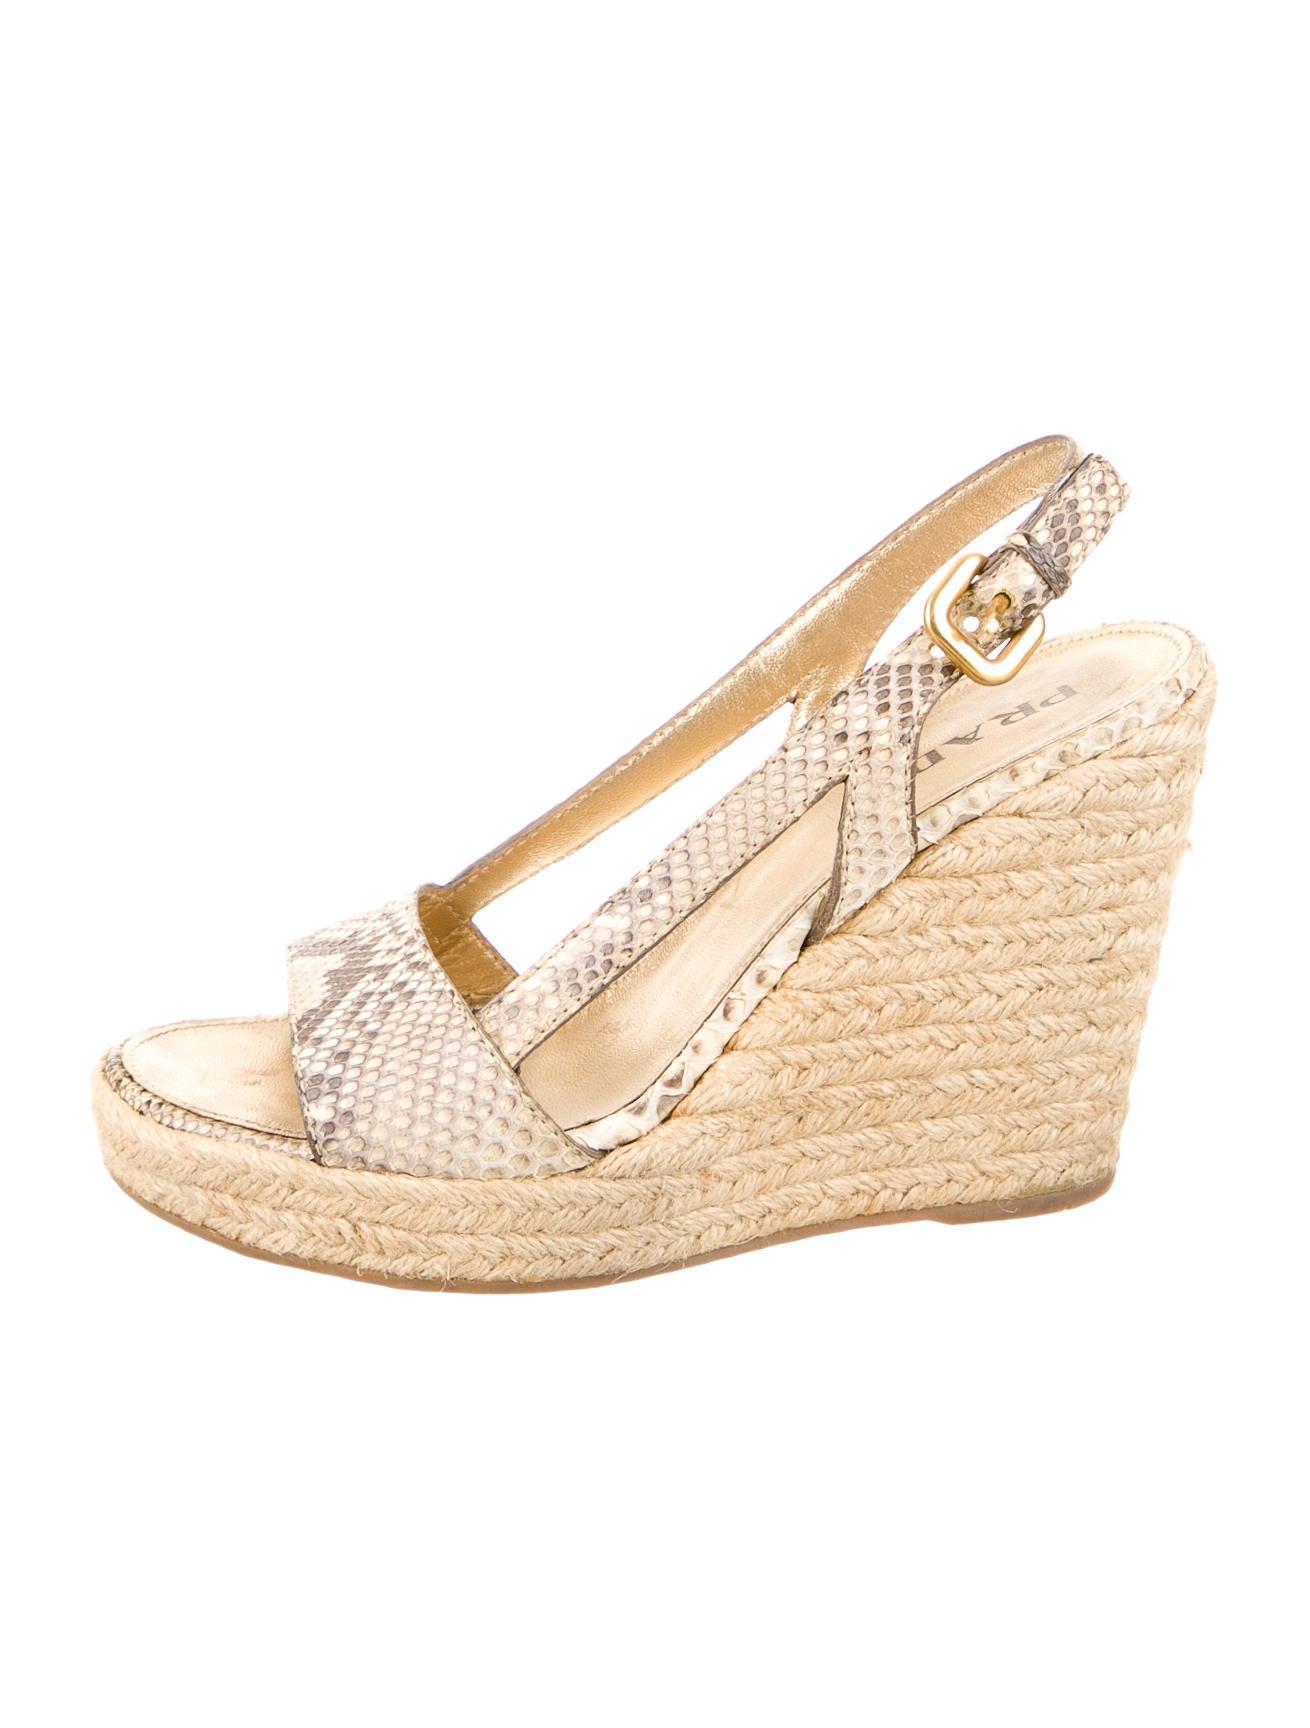 prada snakeskin espadrille wedges shoes pra61211 the